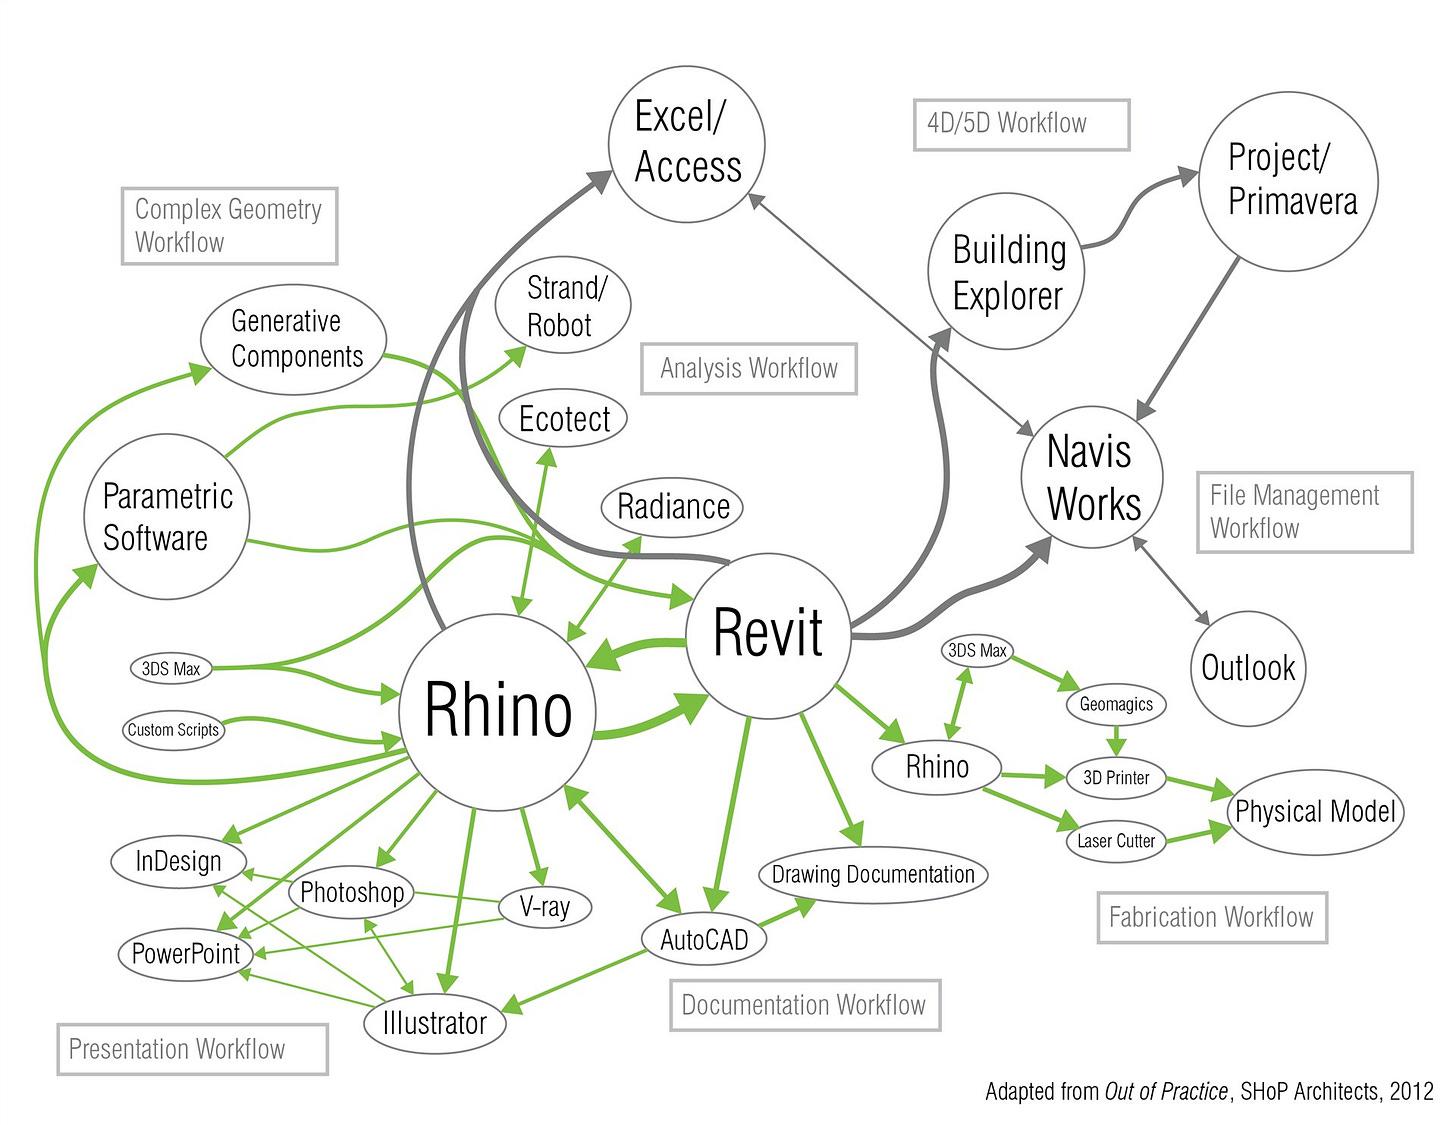 SHOP Architects Workflow